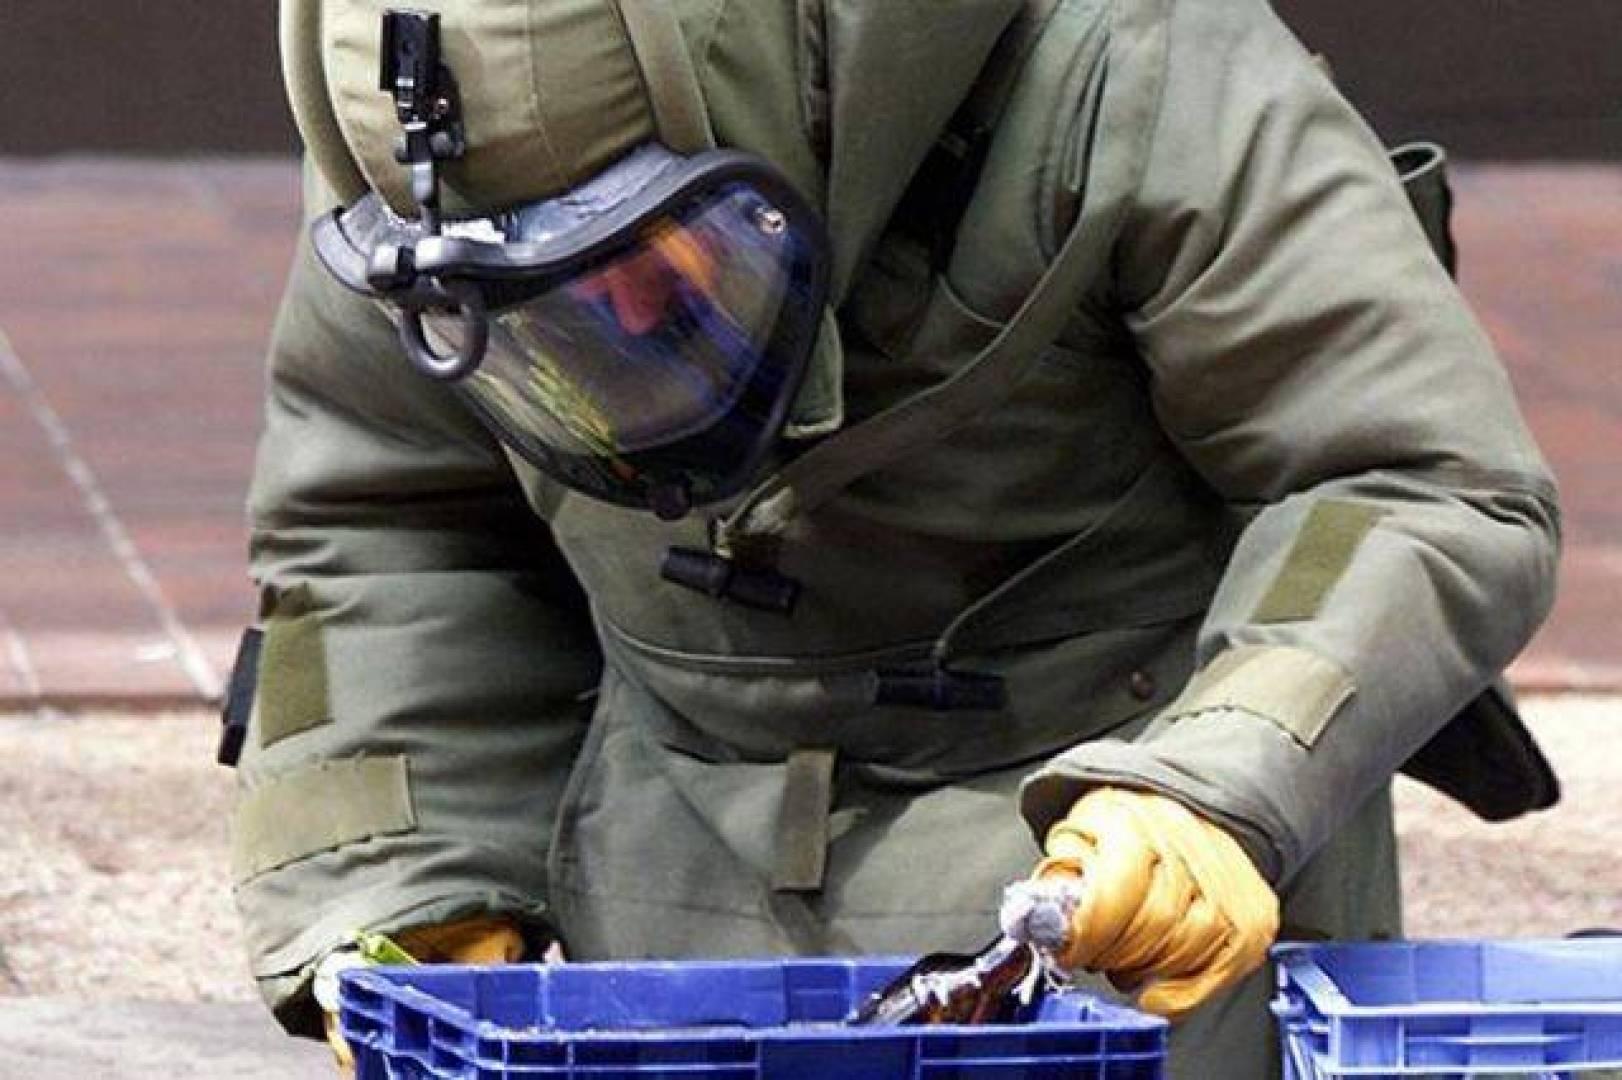 8-most-dangerous-jobs-91_970794_highres